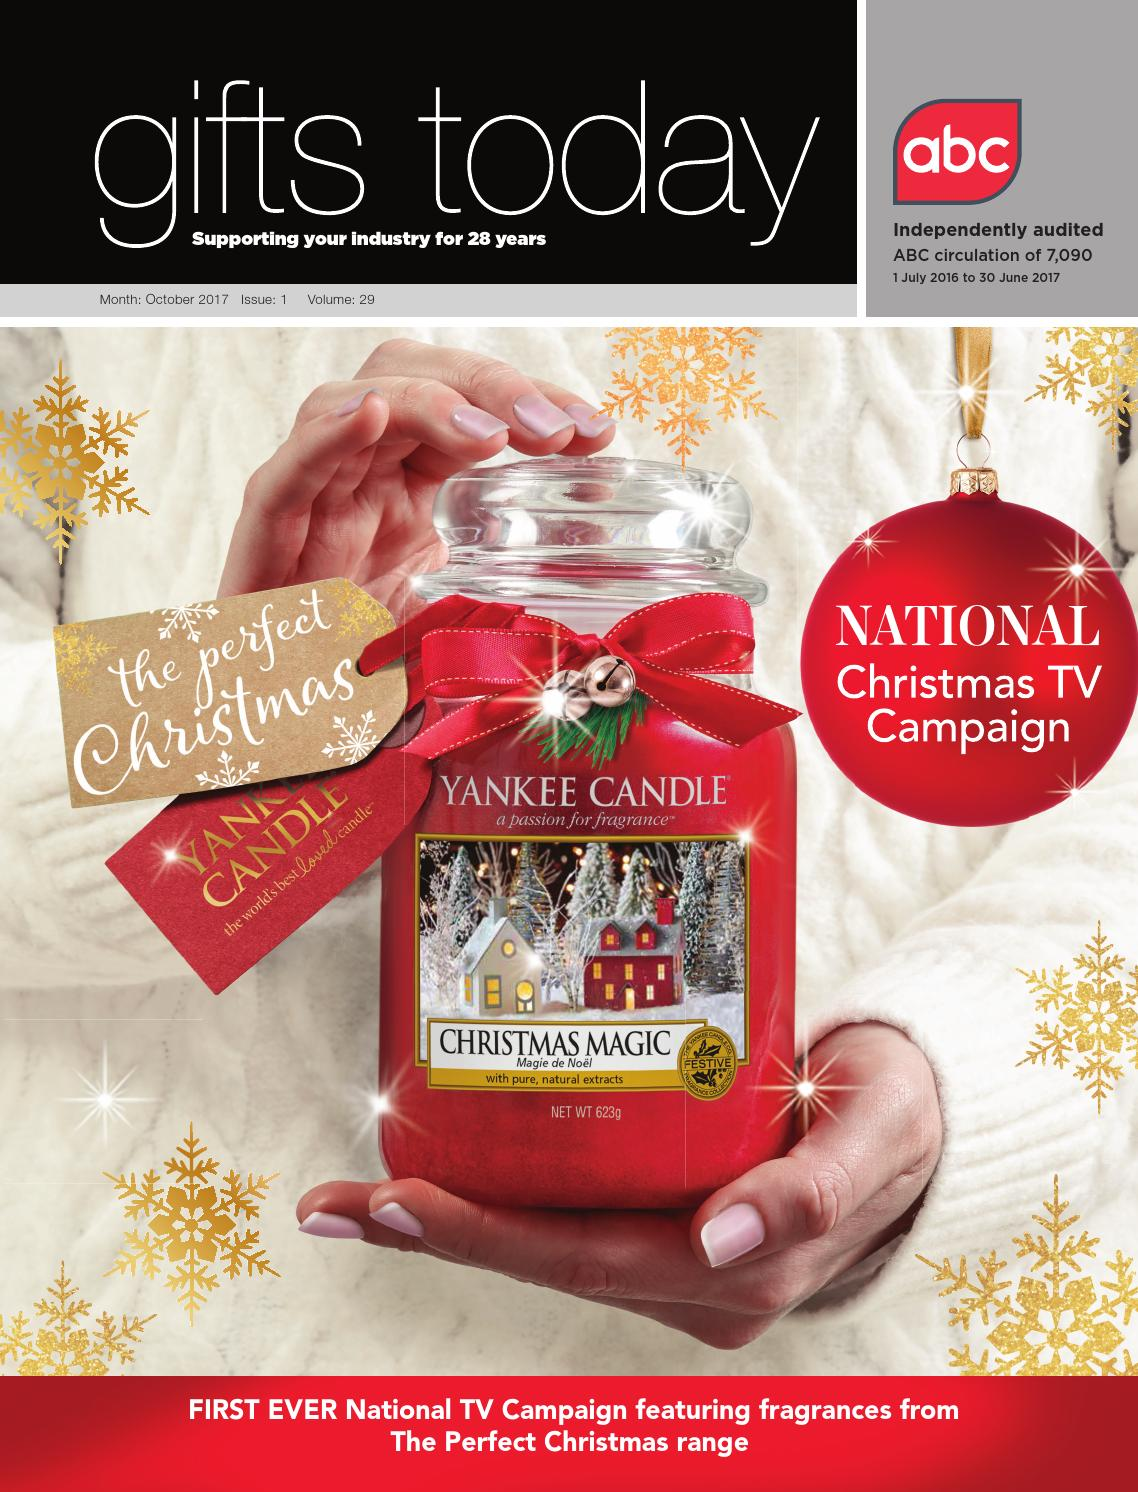 Merry Xmas Noel Mini Heart Tin Gift Present Happy Christmas Stocking Filler